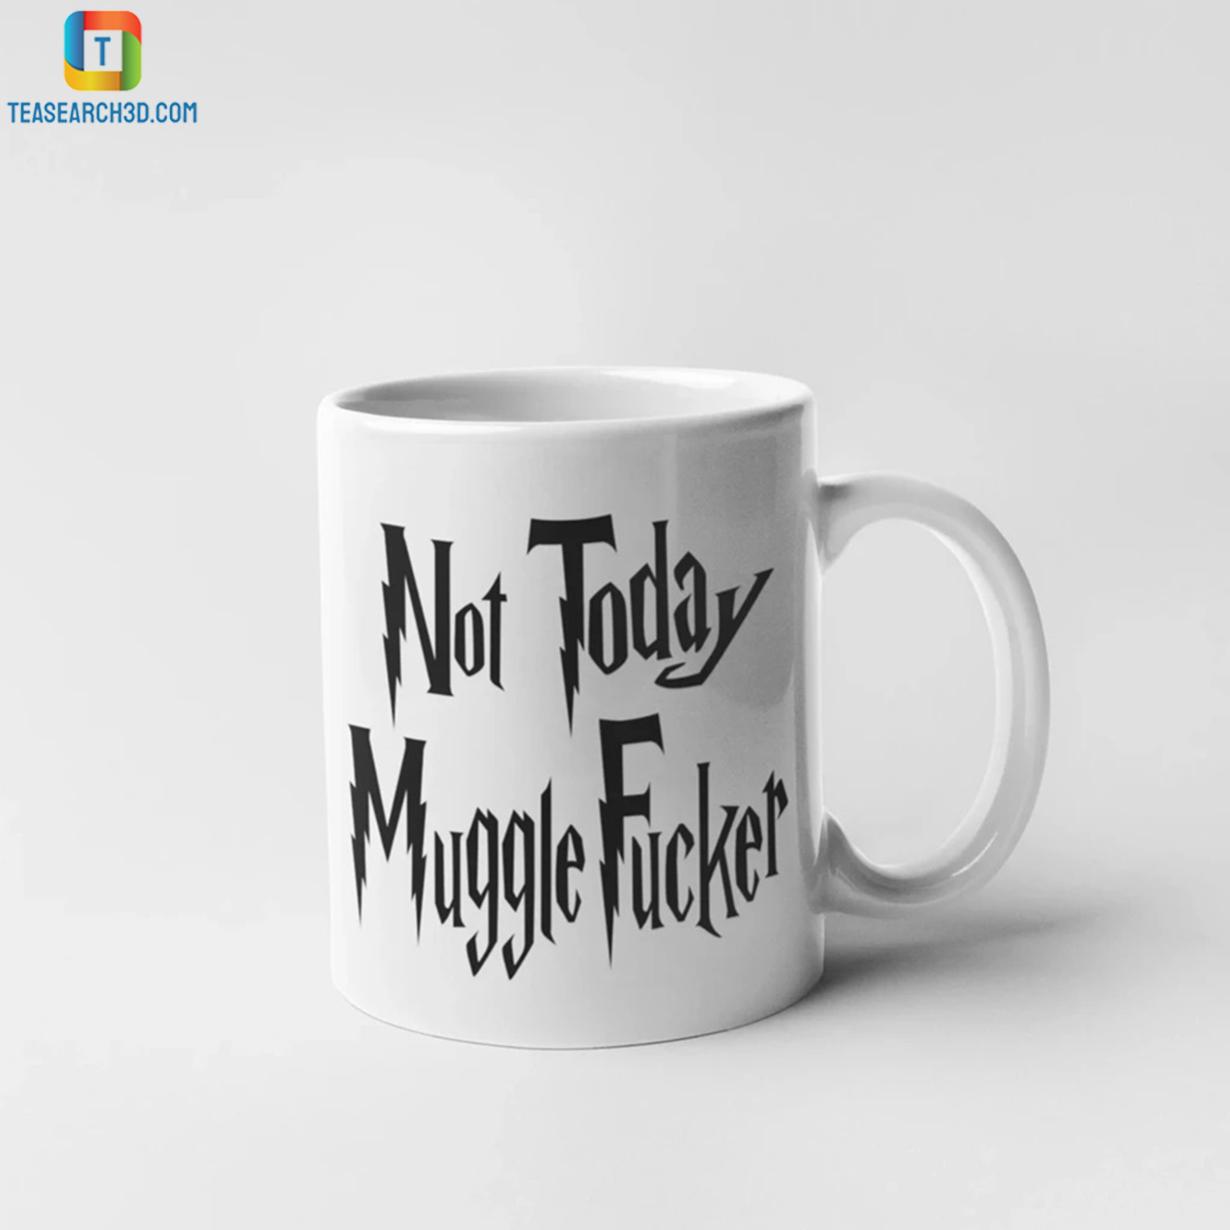 Not today mugglefucker mug 2